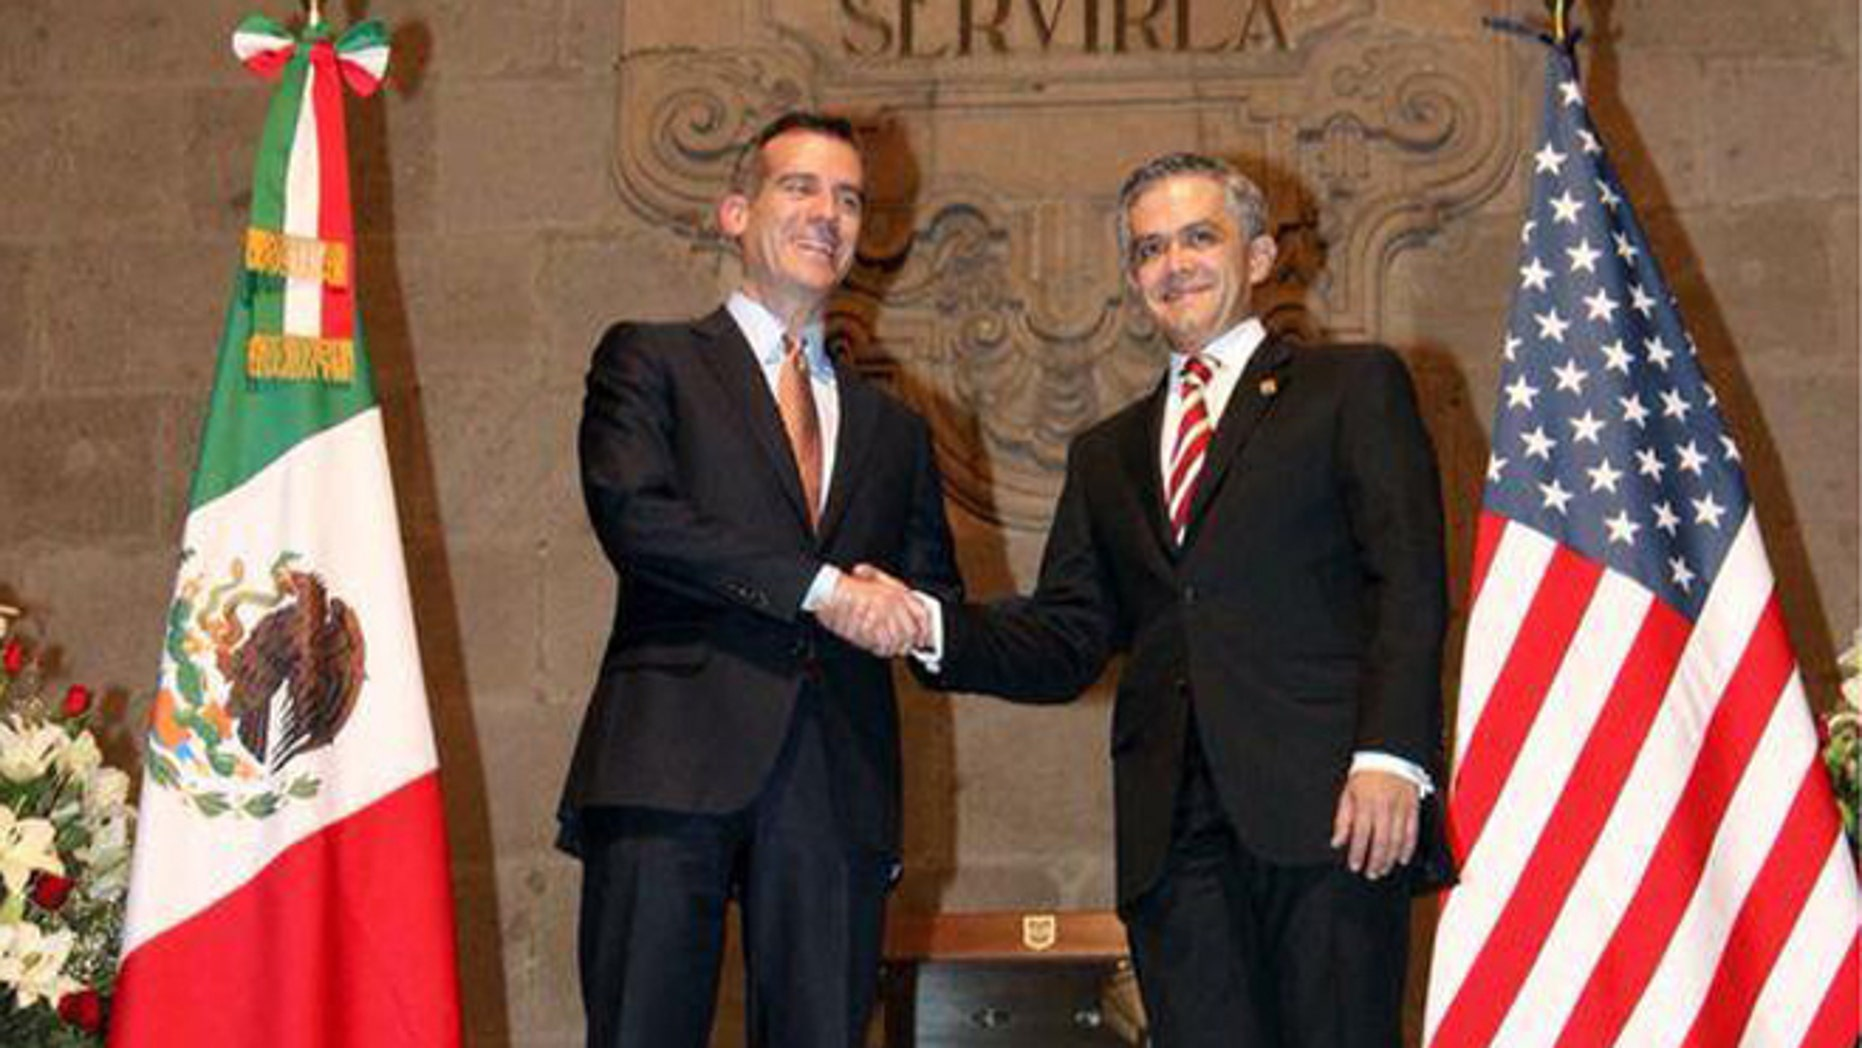 Mayor Eric Garcetti meets with Mexico City Mayor Miguel Mancera. (Photo by Mayor of Los Angeles)